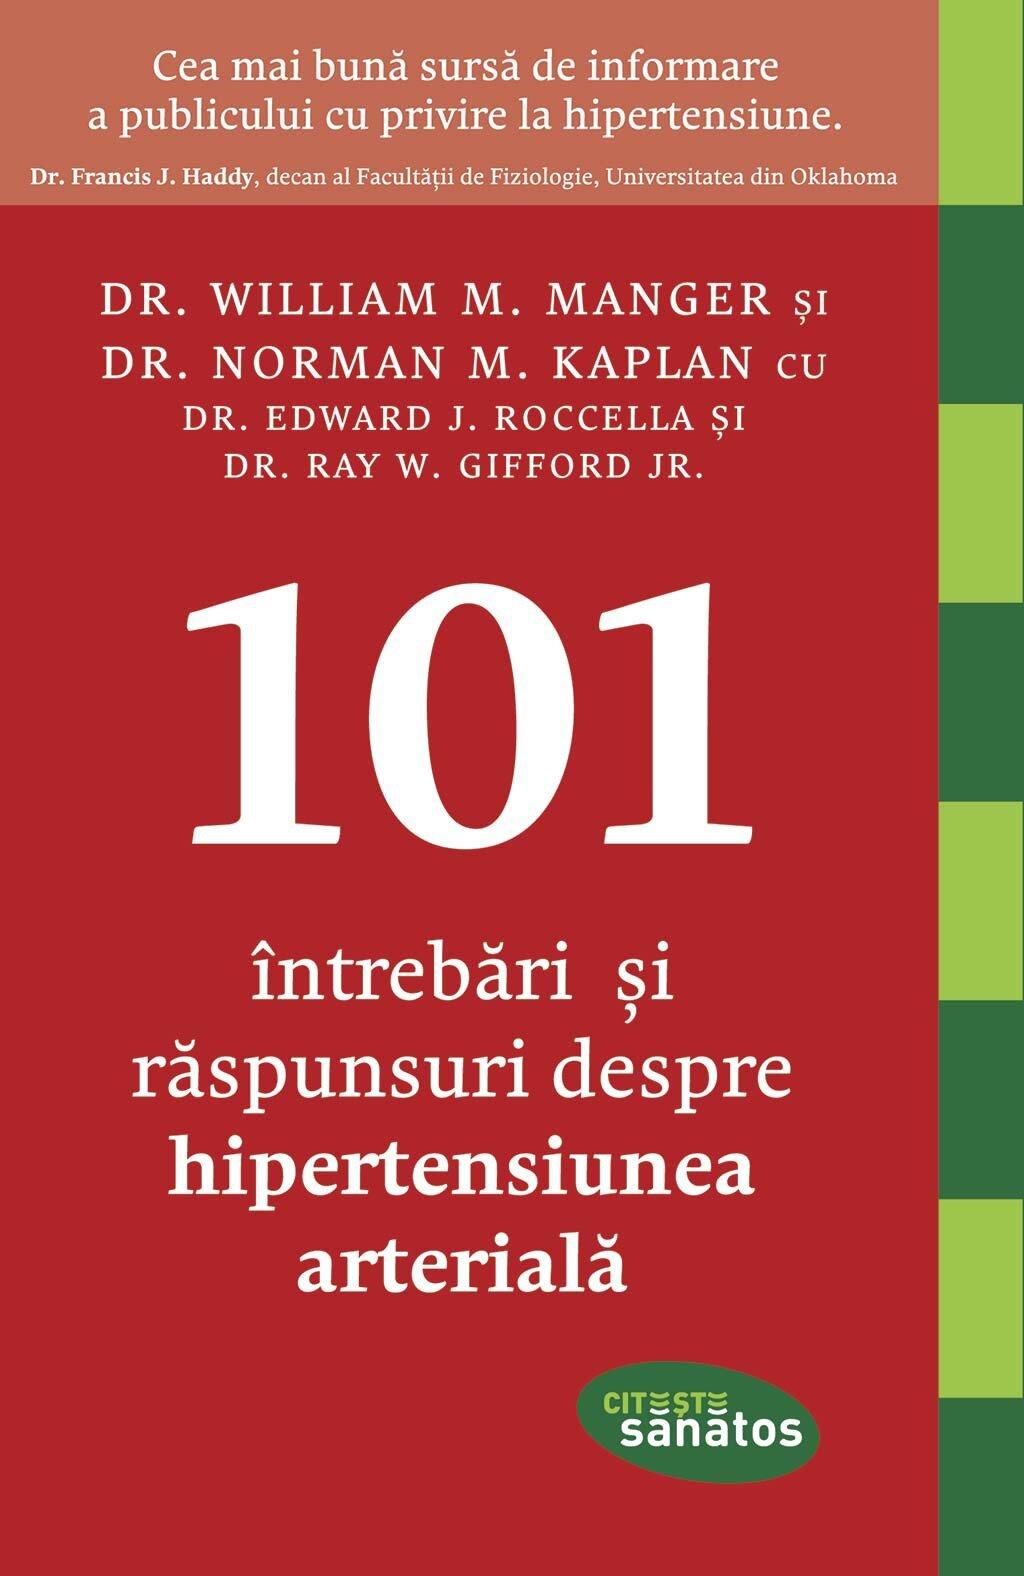 101 Intrebari si raspunsuri despre hipertensiunea arteriala (eBook)